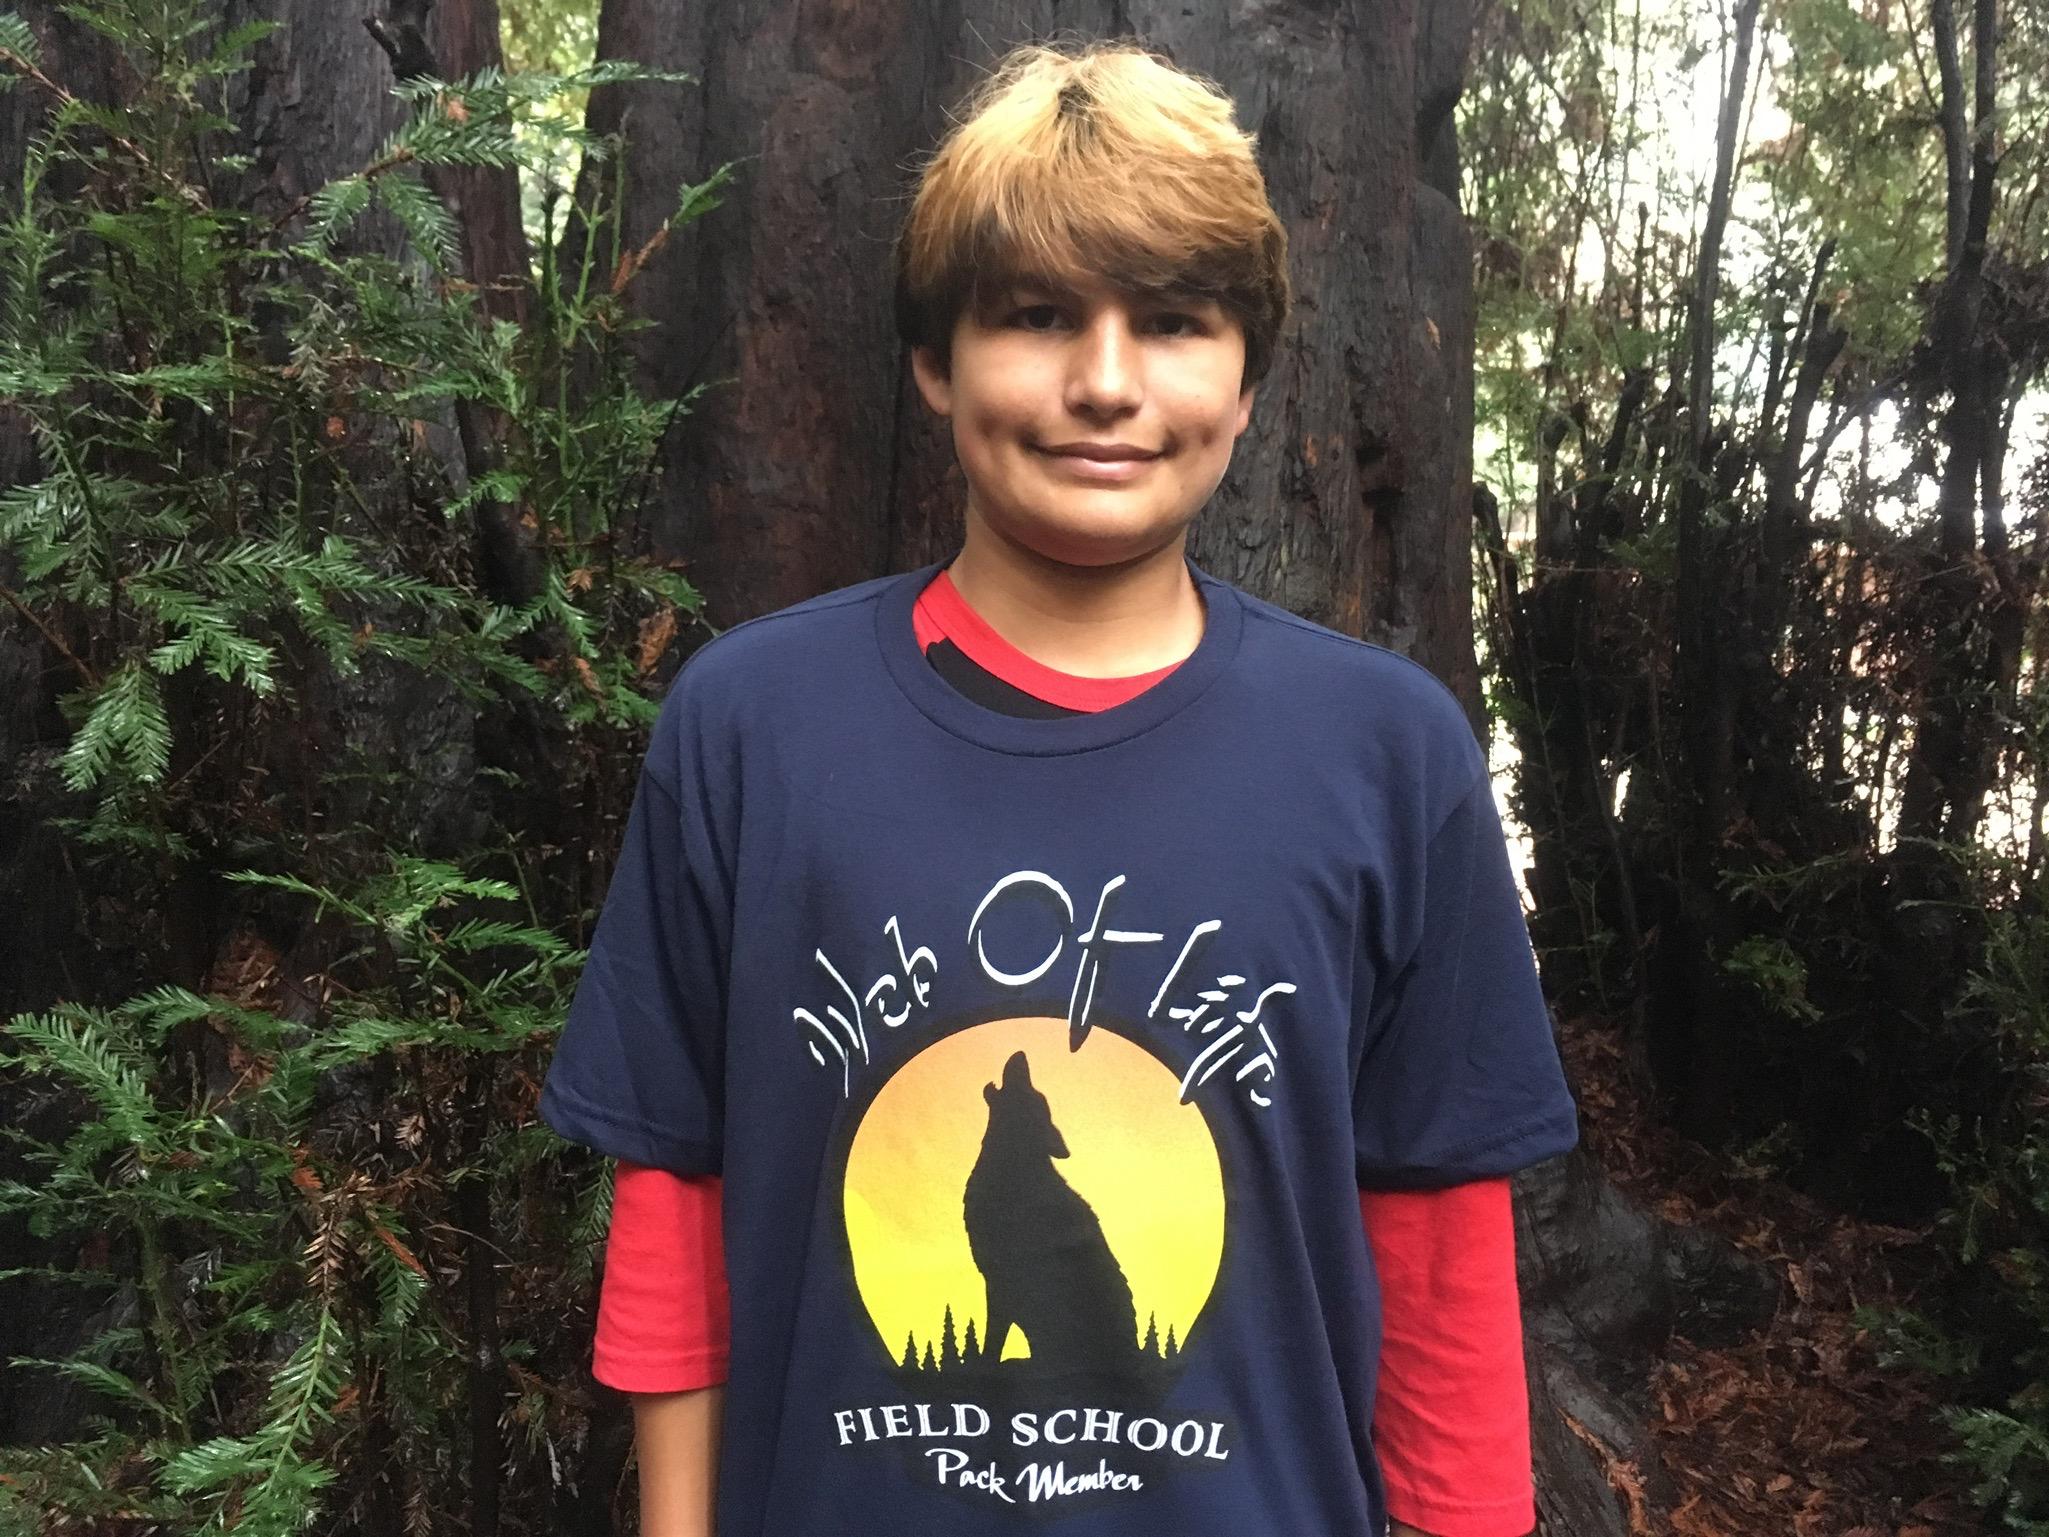 New WOLF School Merch! 100% Recycled T-Shirt in Navy, Worn By WOLF School Day Camper.jpg